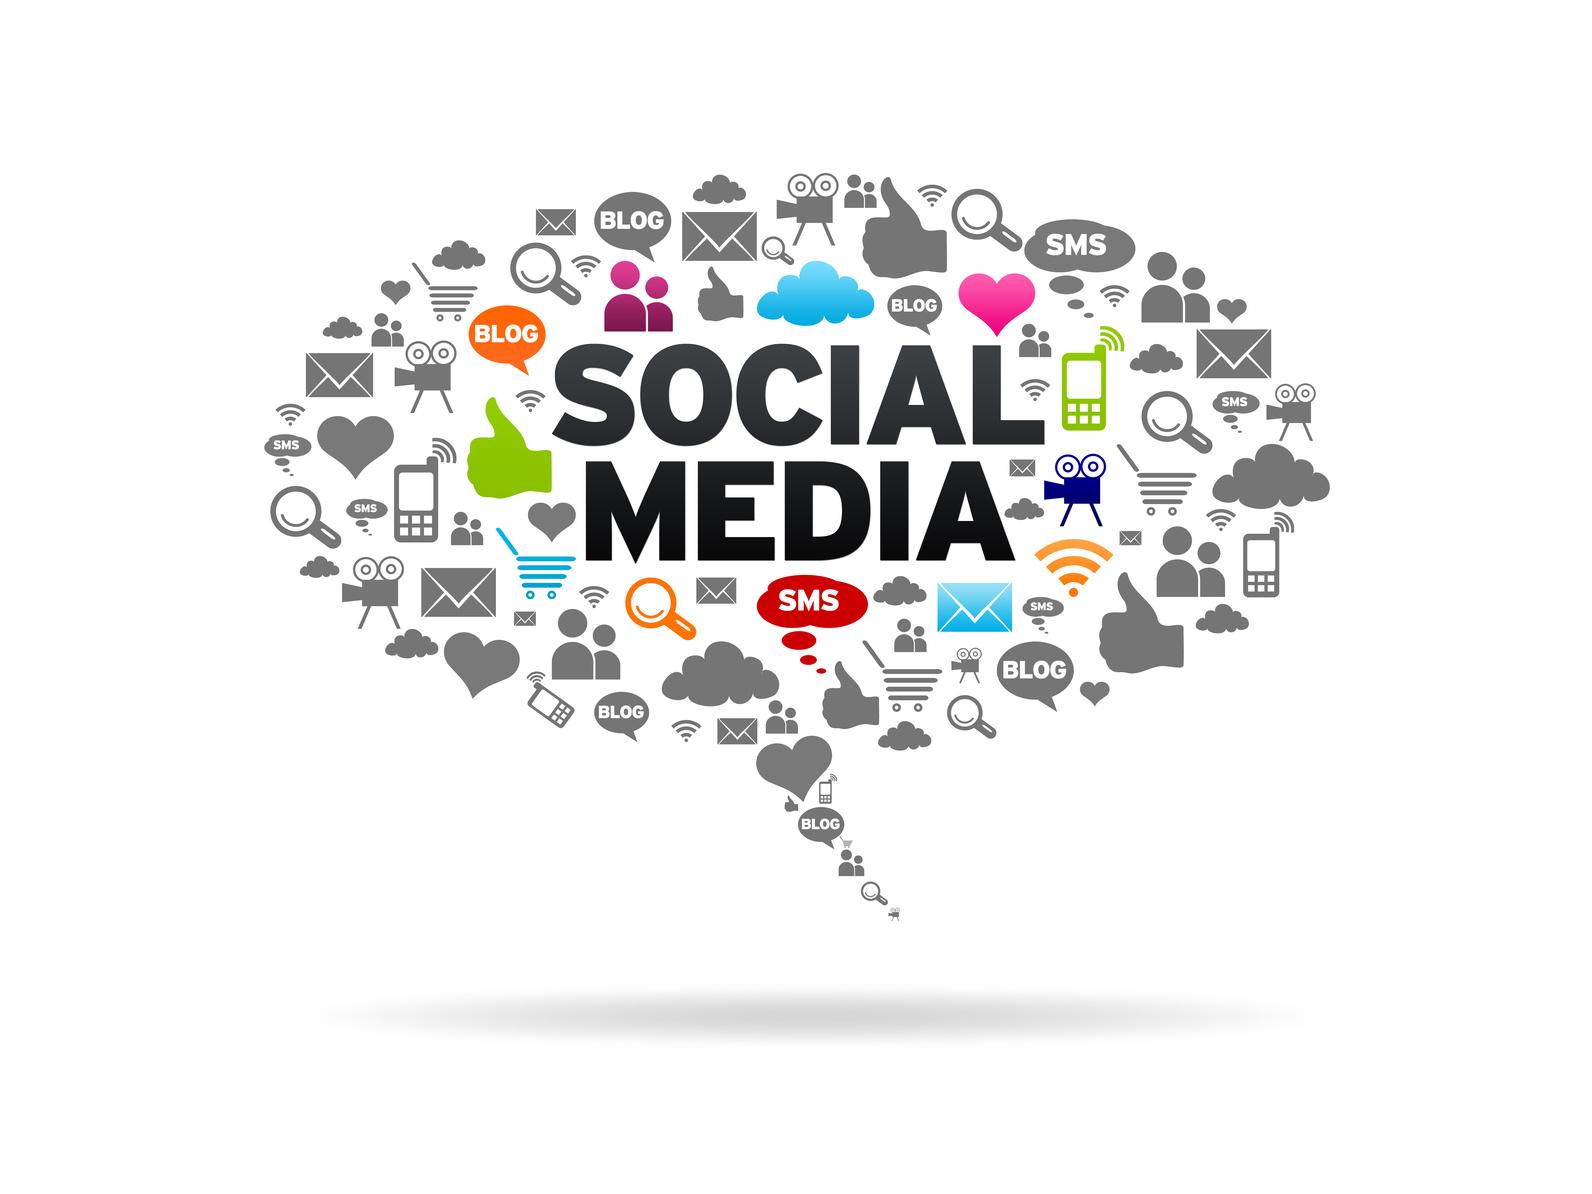 http://www.itsolution.com.sg/wp-content/uploads/2015/01/Image-SMM-Social-Media.jpg